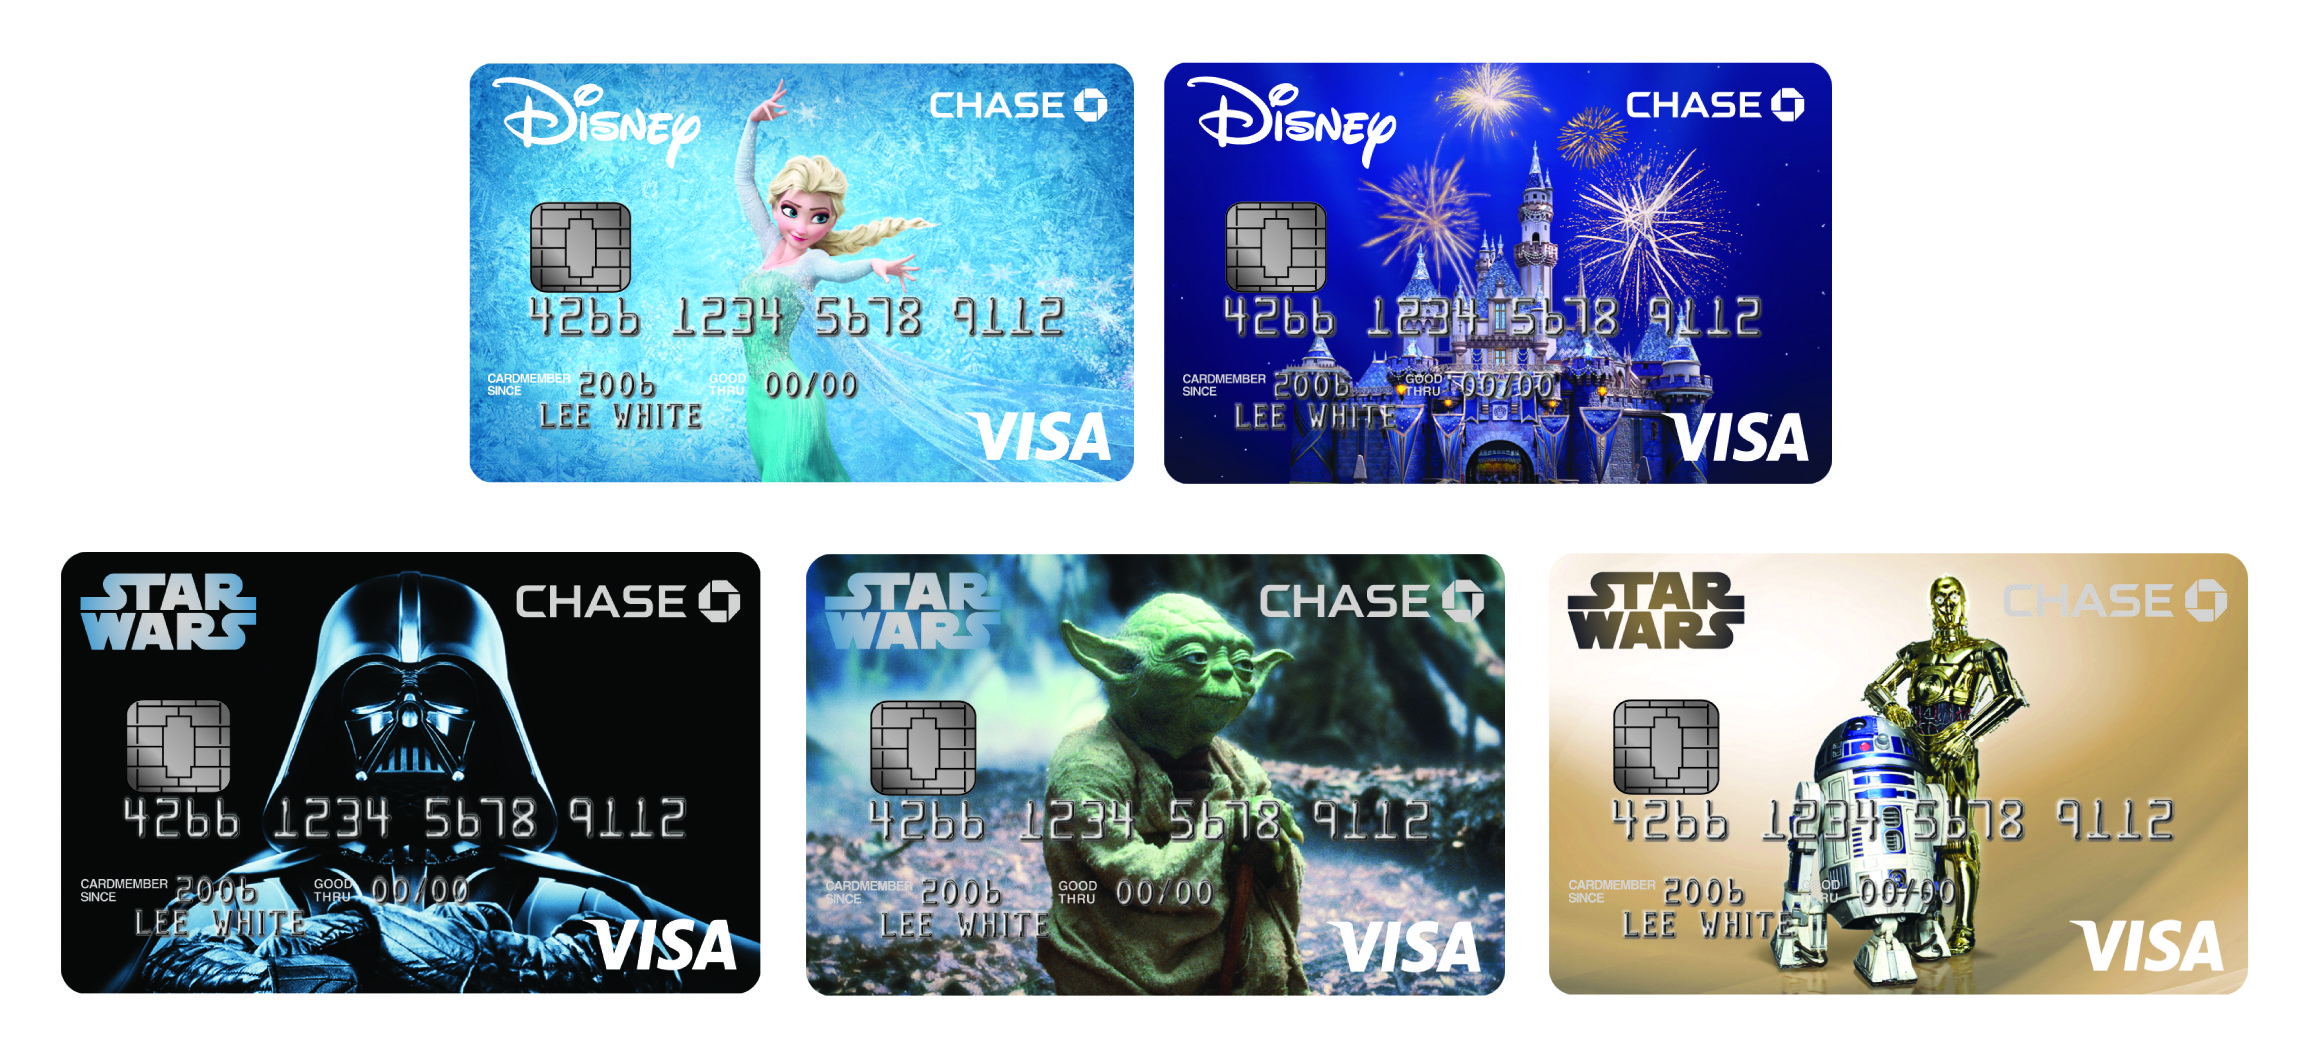 Visa Card Design | 2015 New Card Designs Cluster JPEG